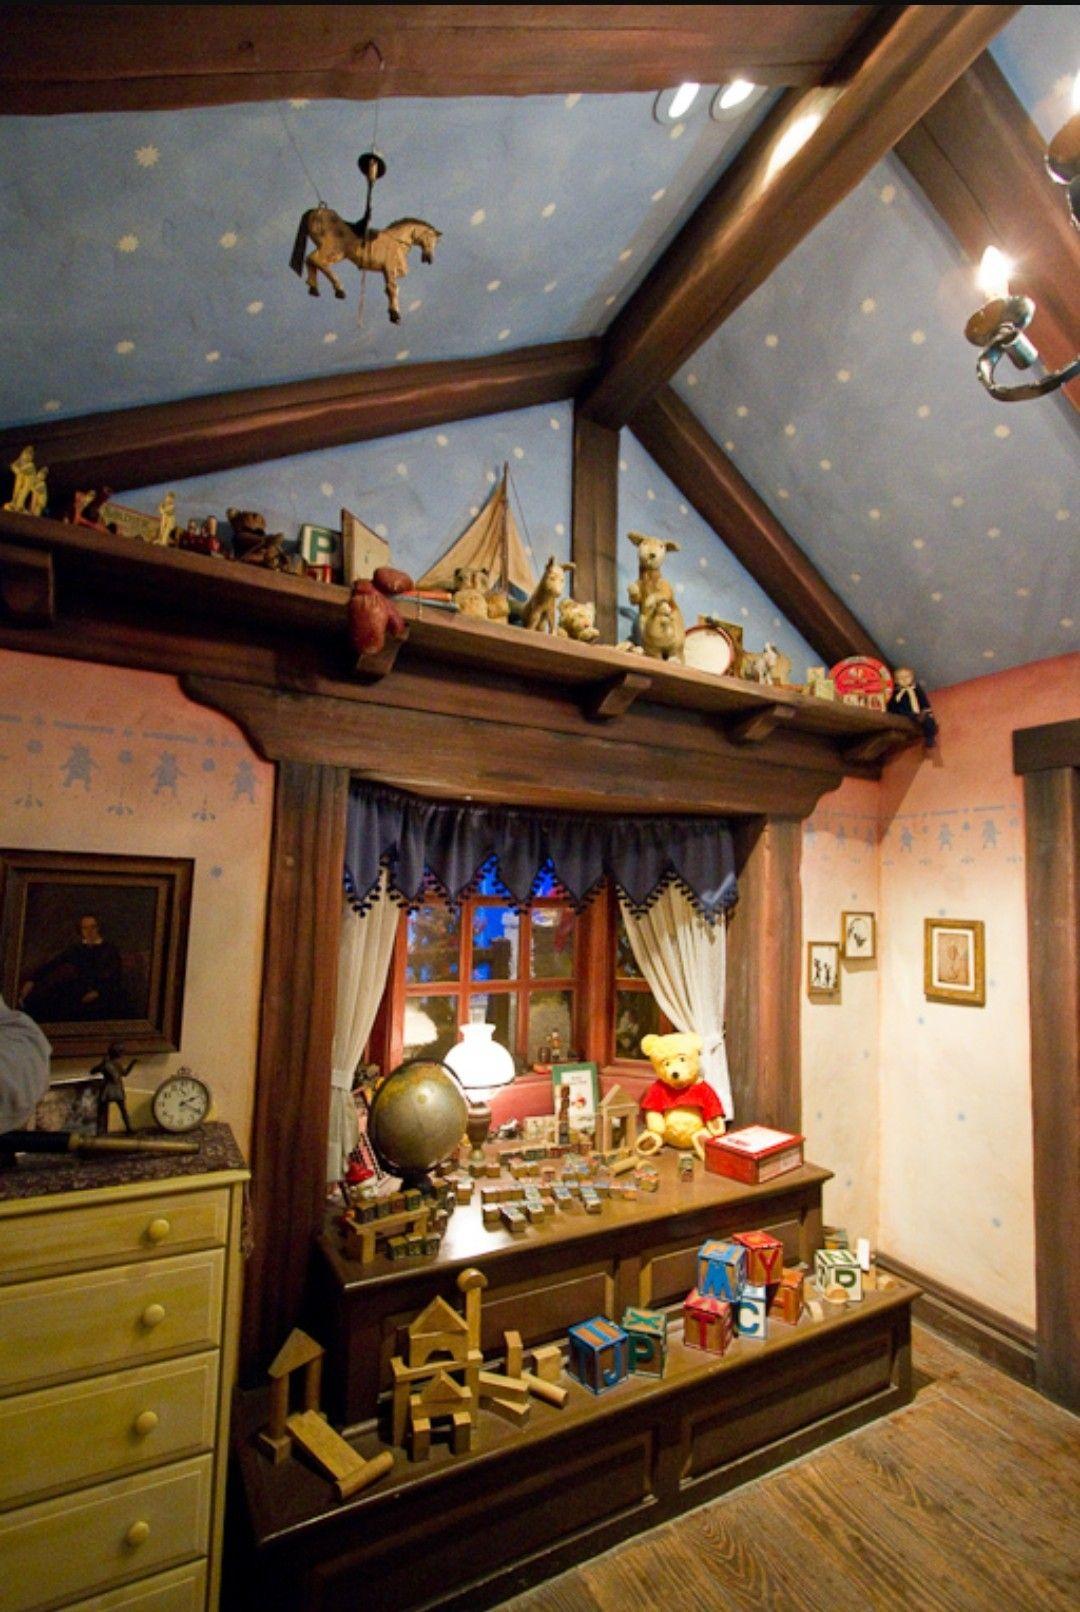 Pooh おしゃれまとめの人気アイデア Pinterest Mon 部屋